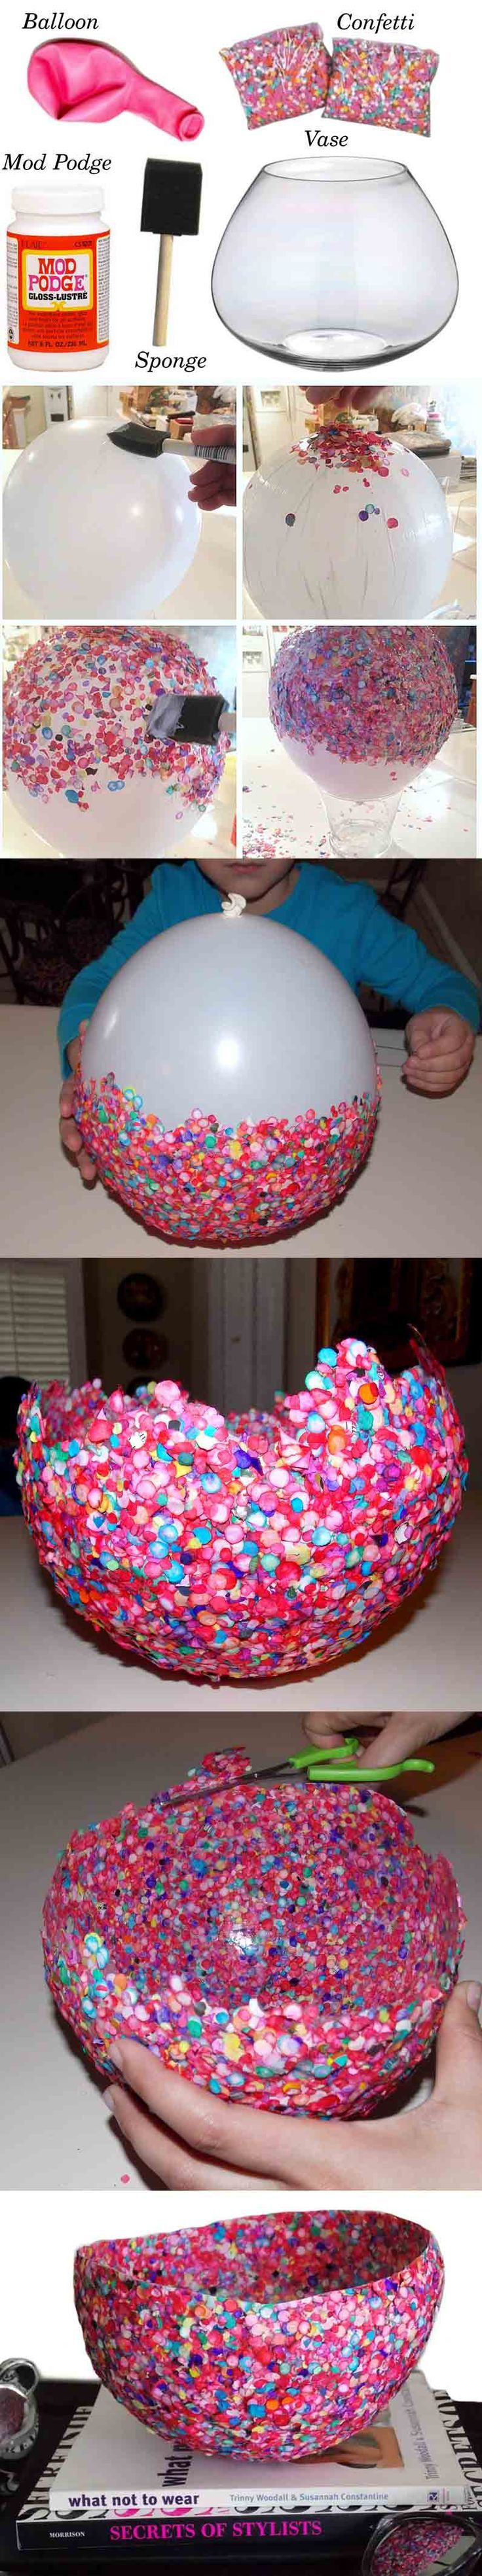 DIY Vase - mit viel Konfetti. :)